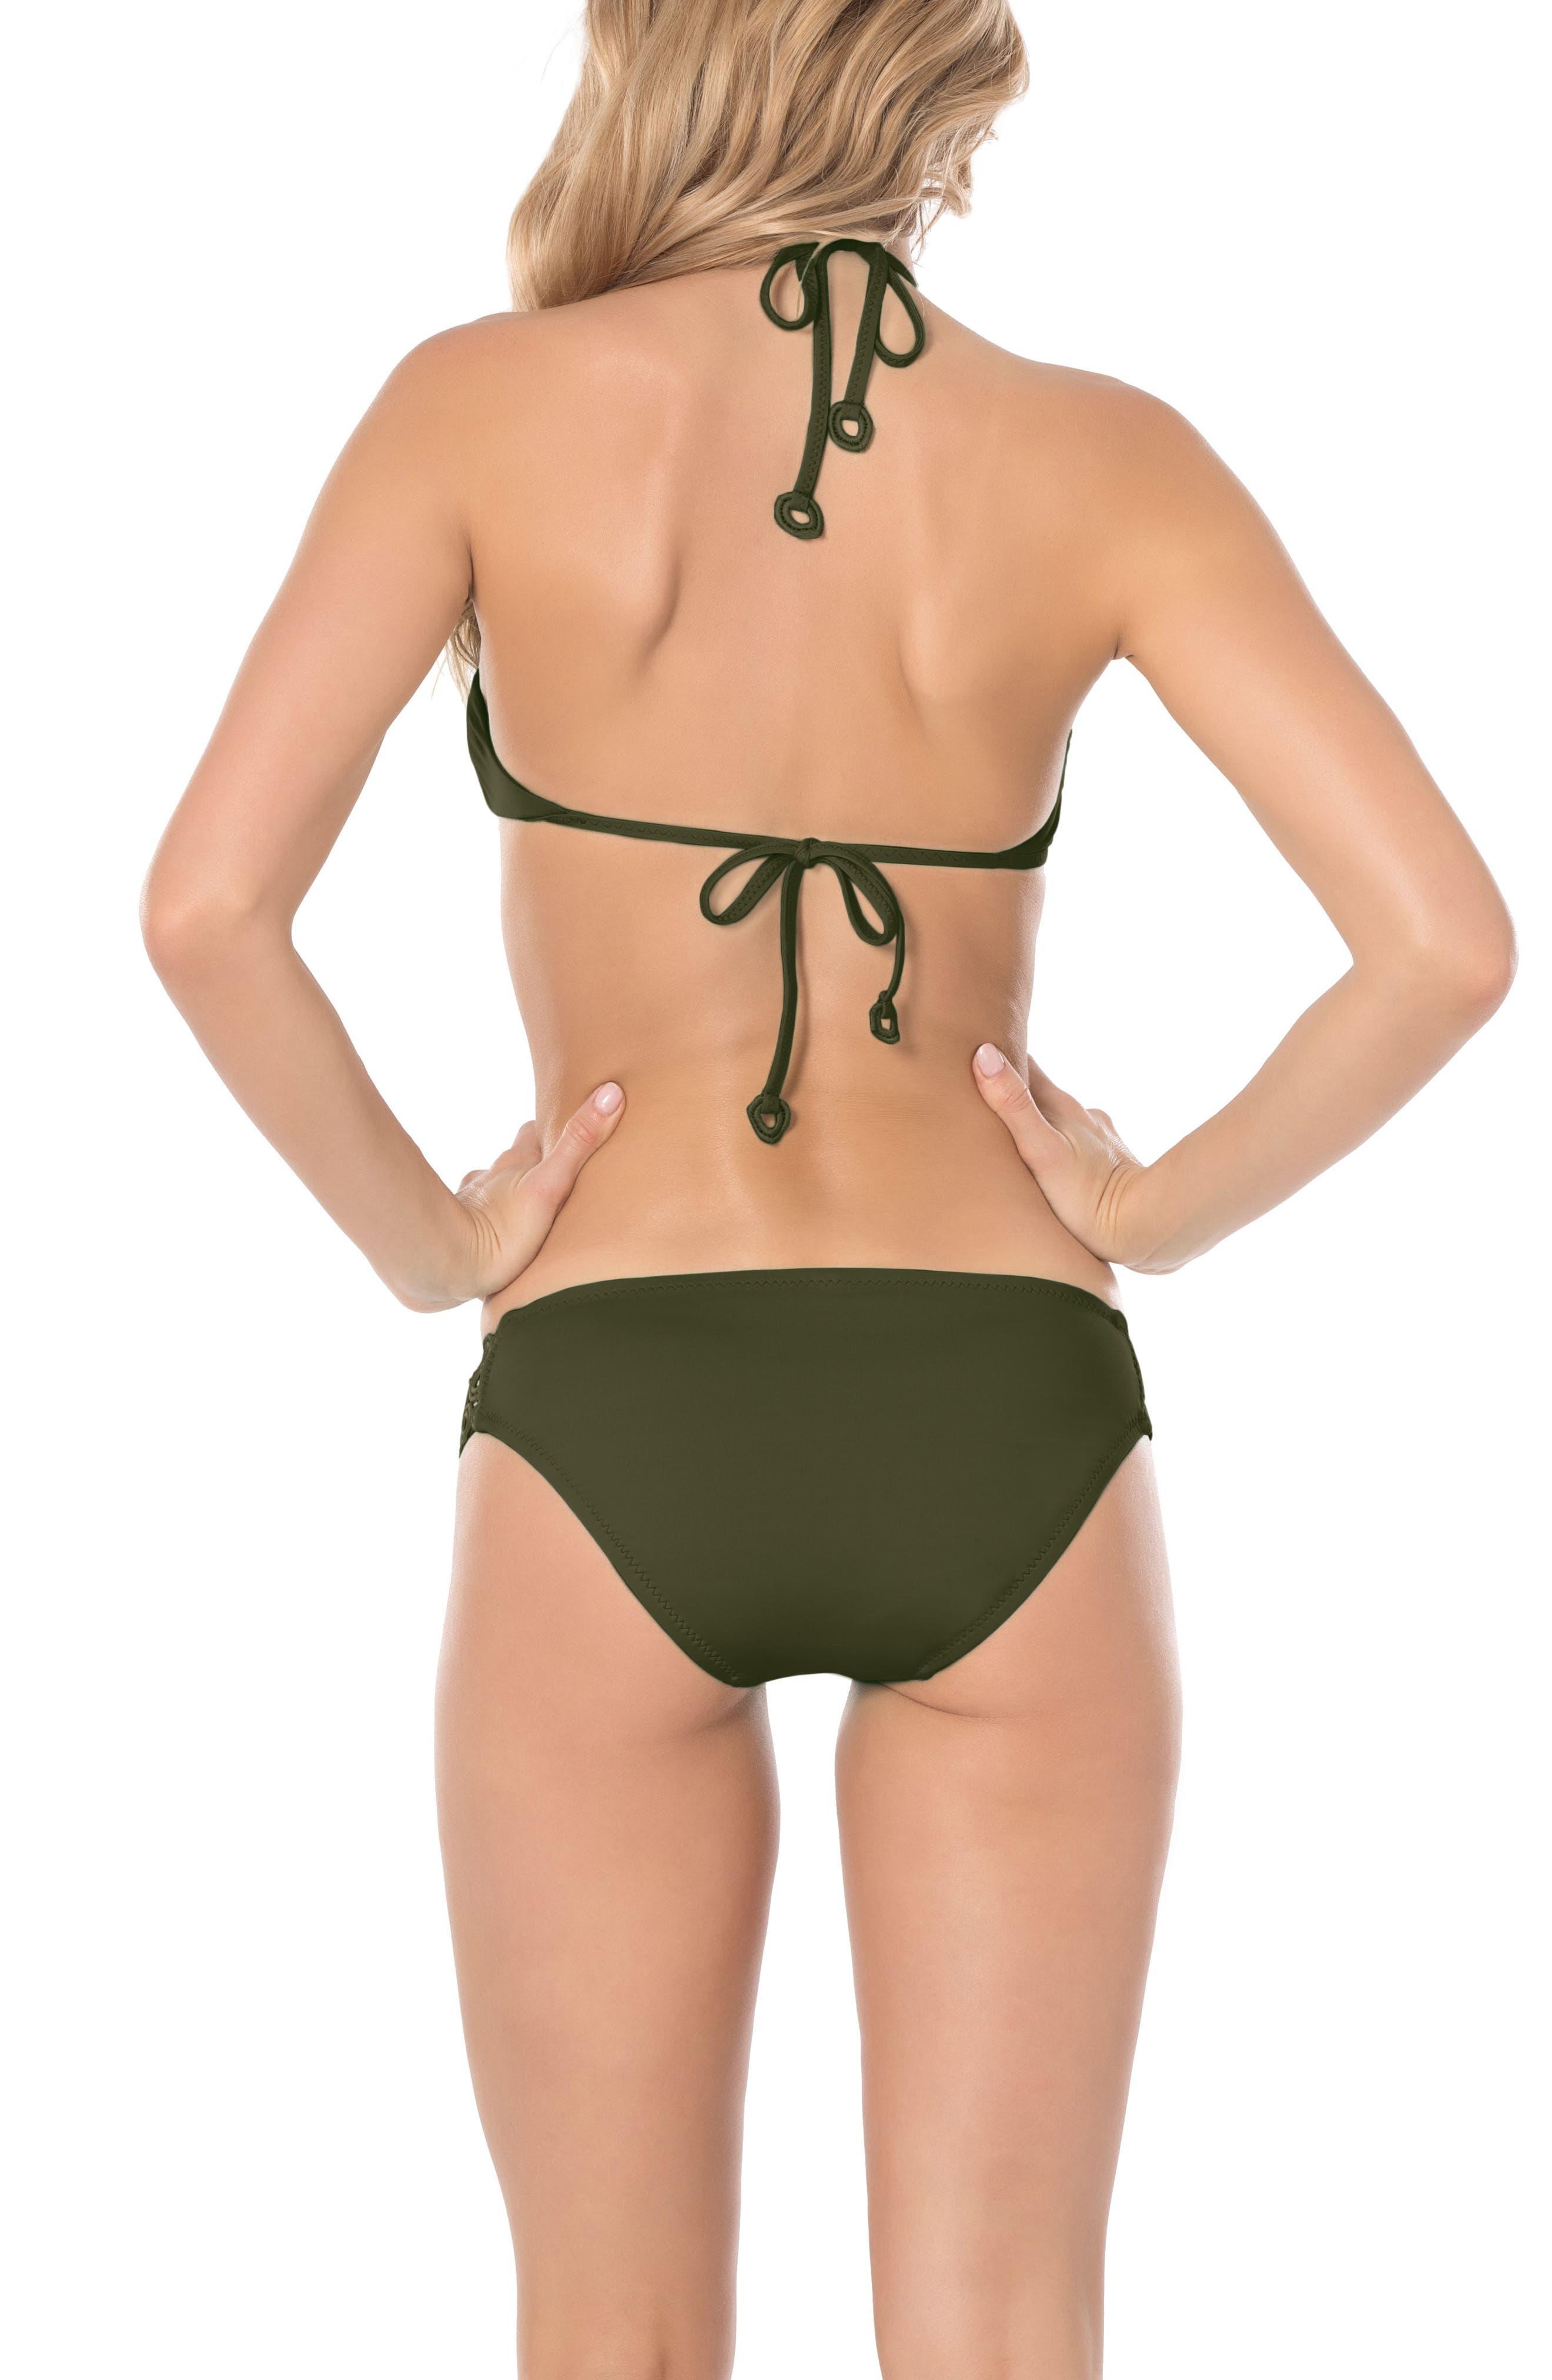 Siren Triangle Bikini Top,                             Alternate thumbnail 4, color,                             308